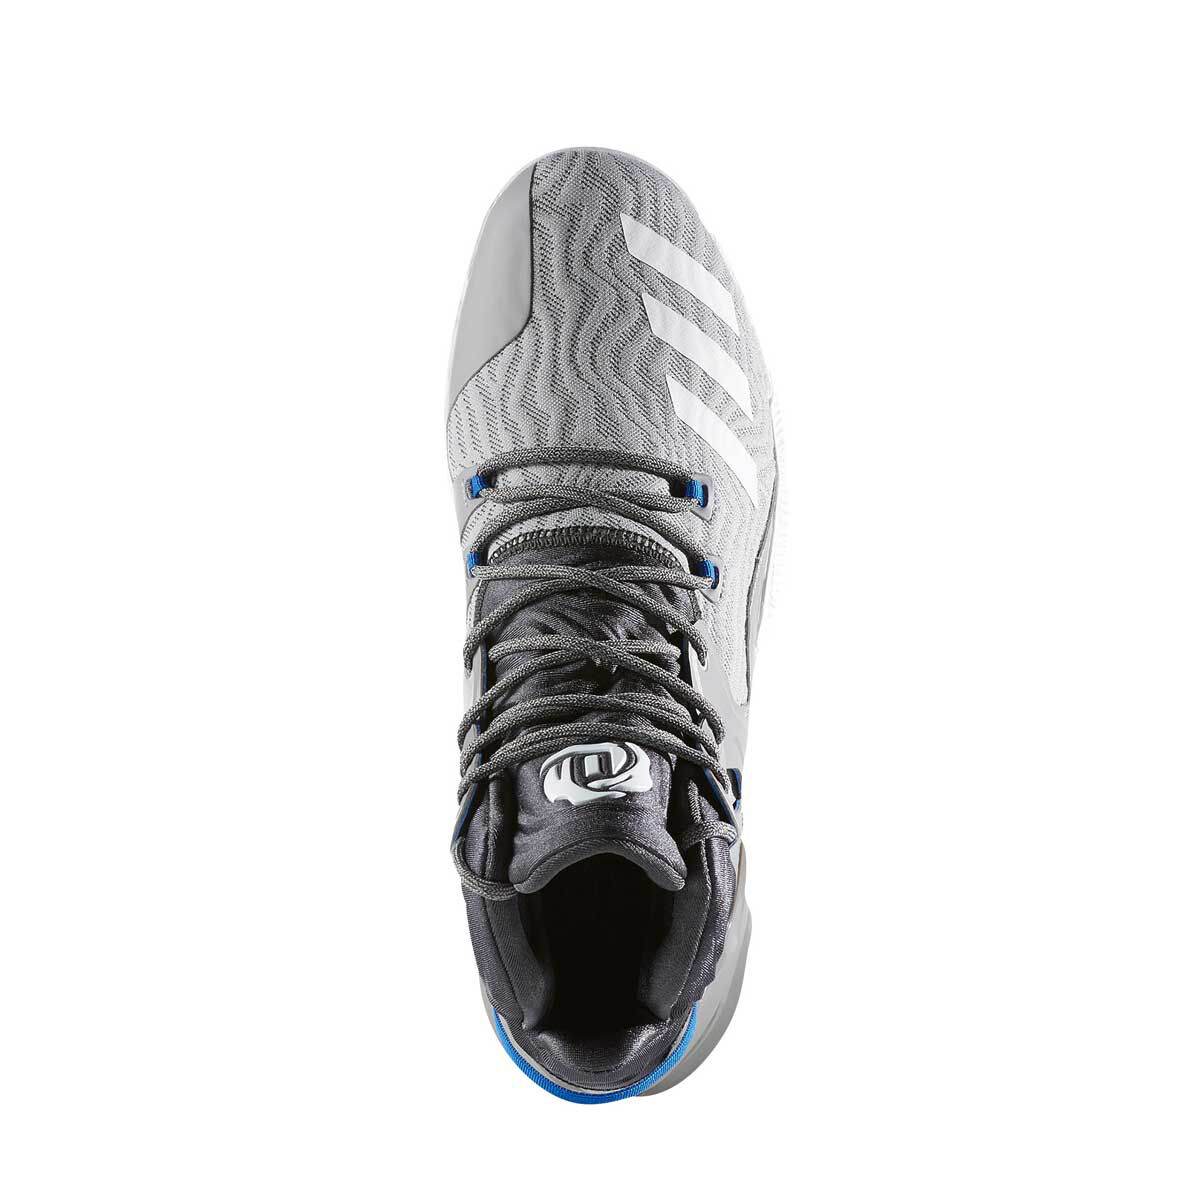 les adidaose chaussures de sport grehite usebel basket adidaose les   2cbde2